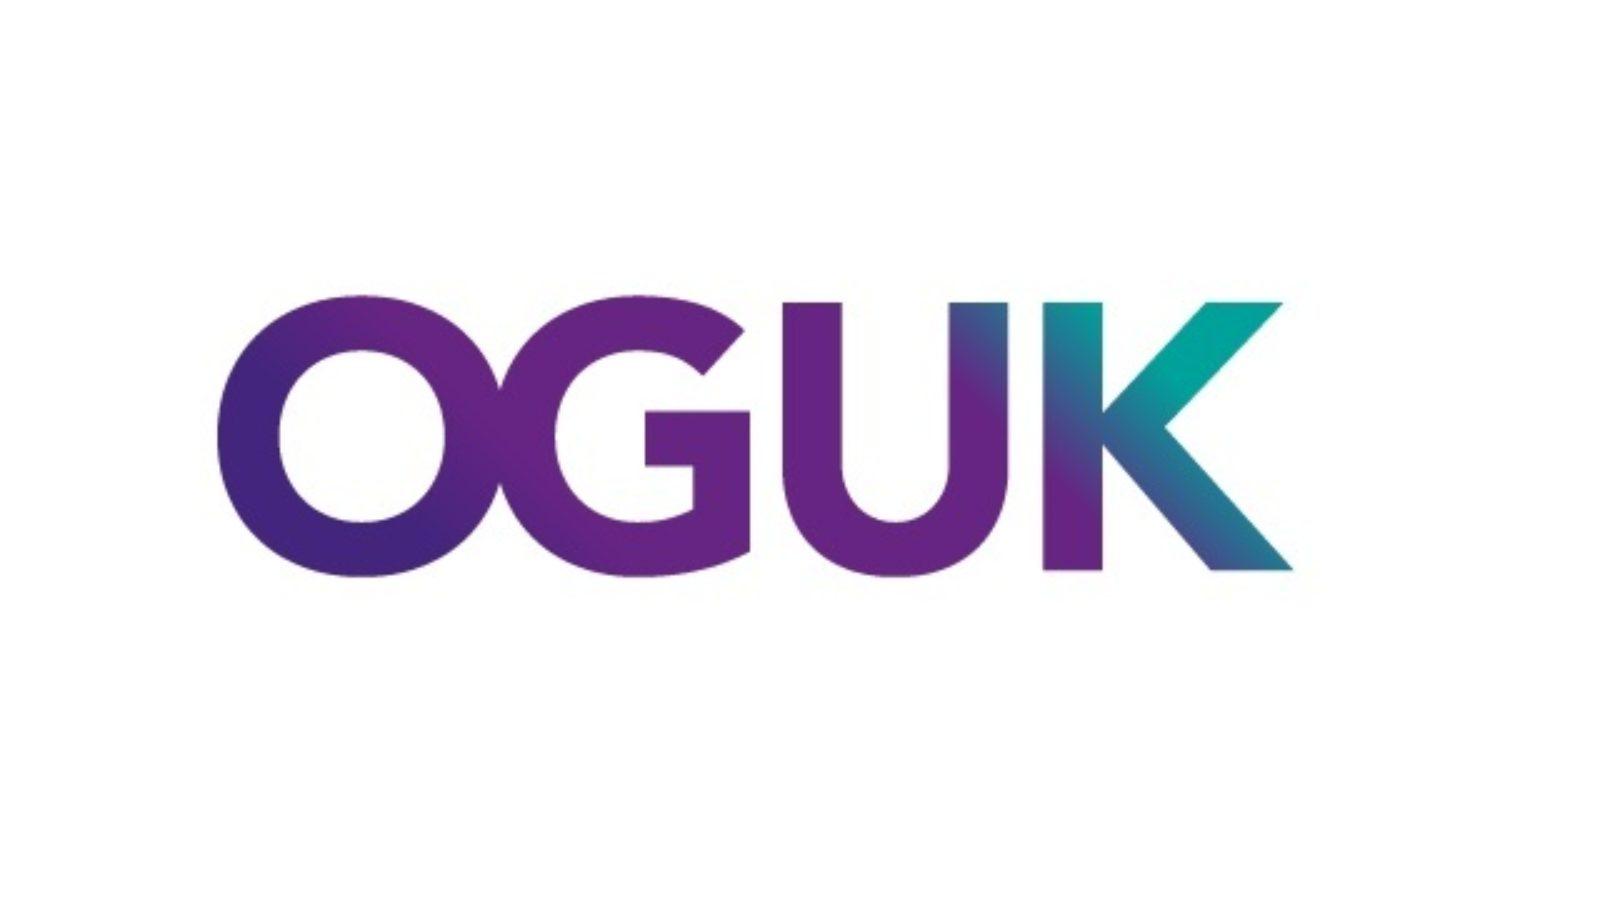 OGUK welcomes OGA's key report into collective industry action towards net zero